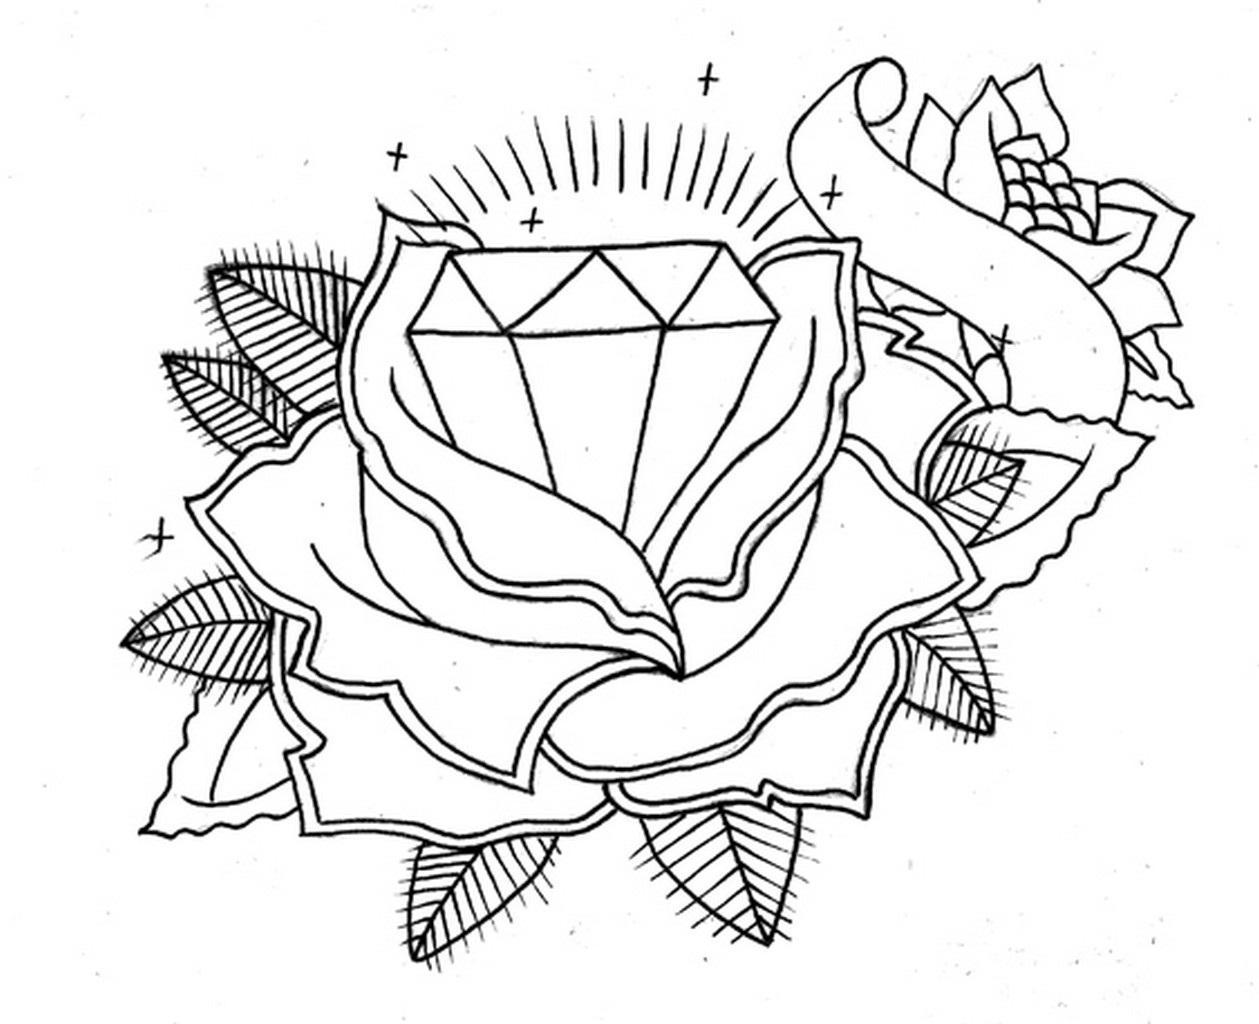 Blue Diamond Tattoo Meaning Diamond tattoos meaning